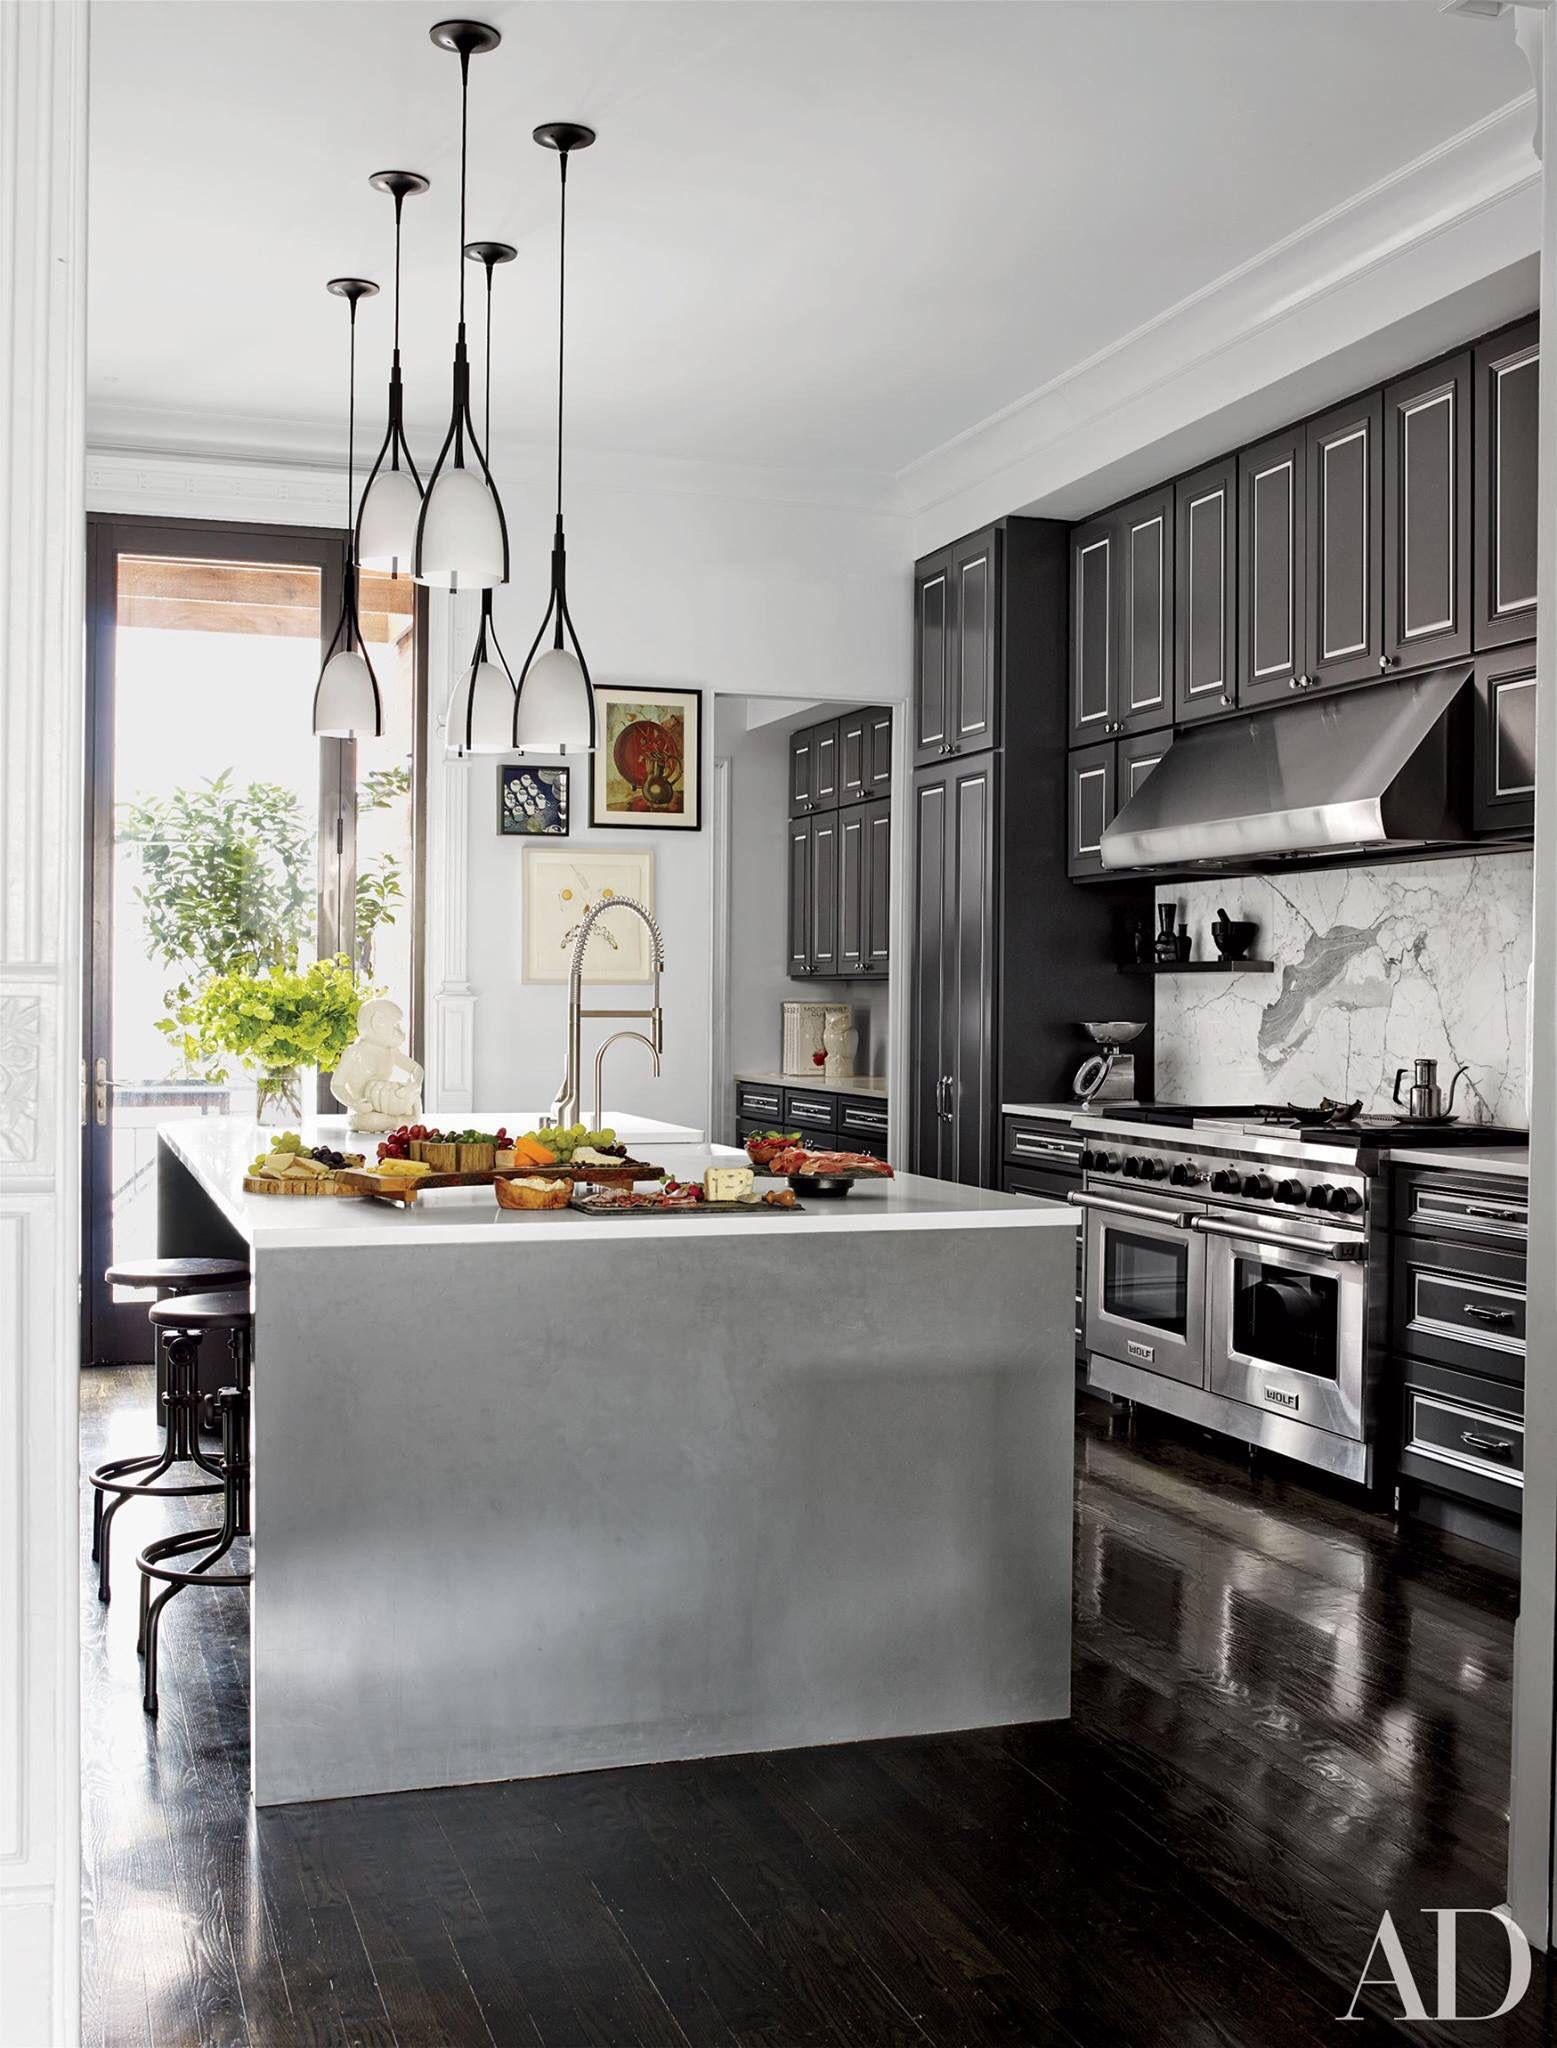 Pin by erika howell on the elegant farmhouse pinterest kitchens